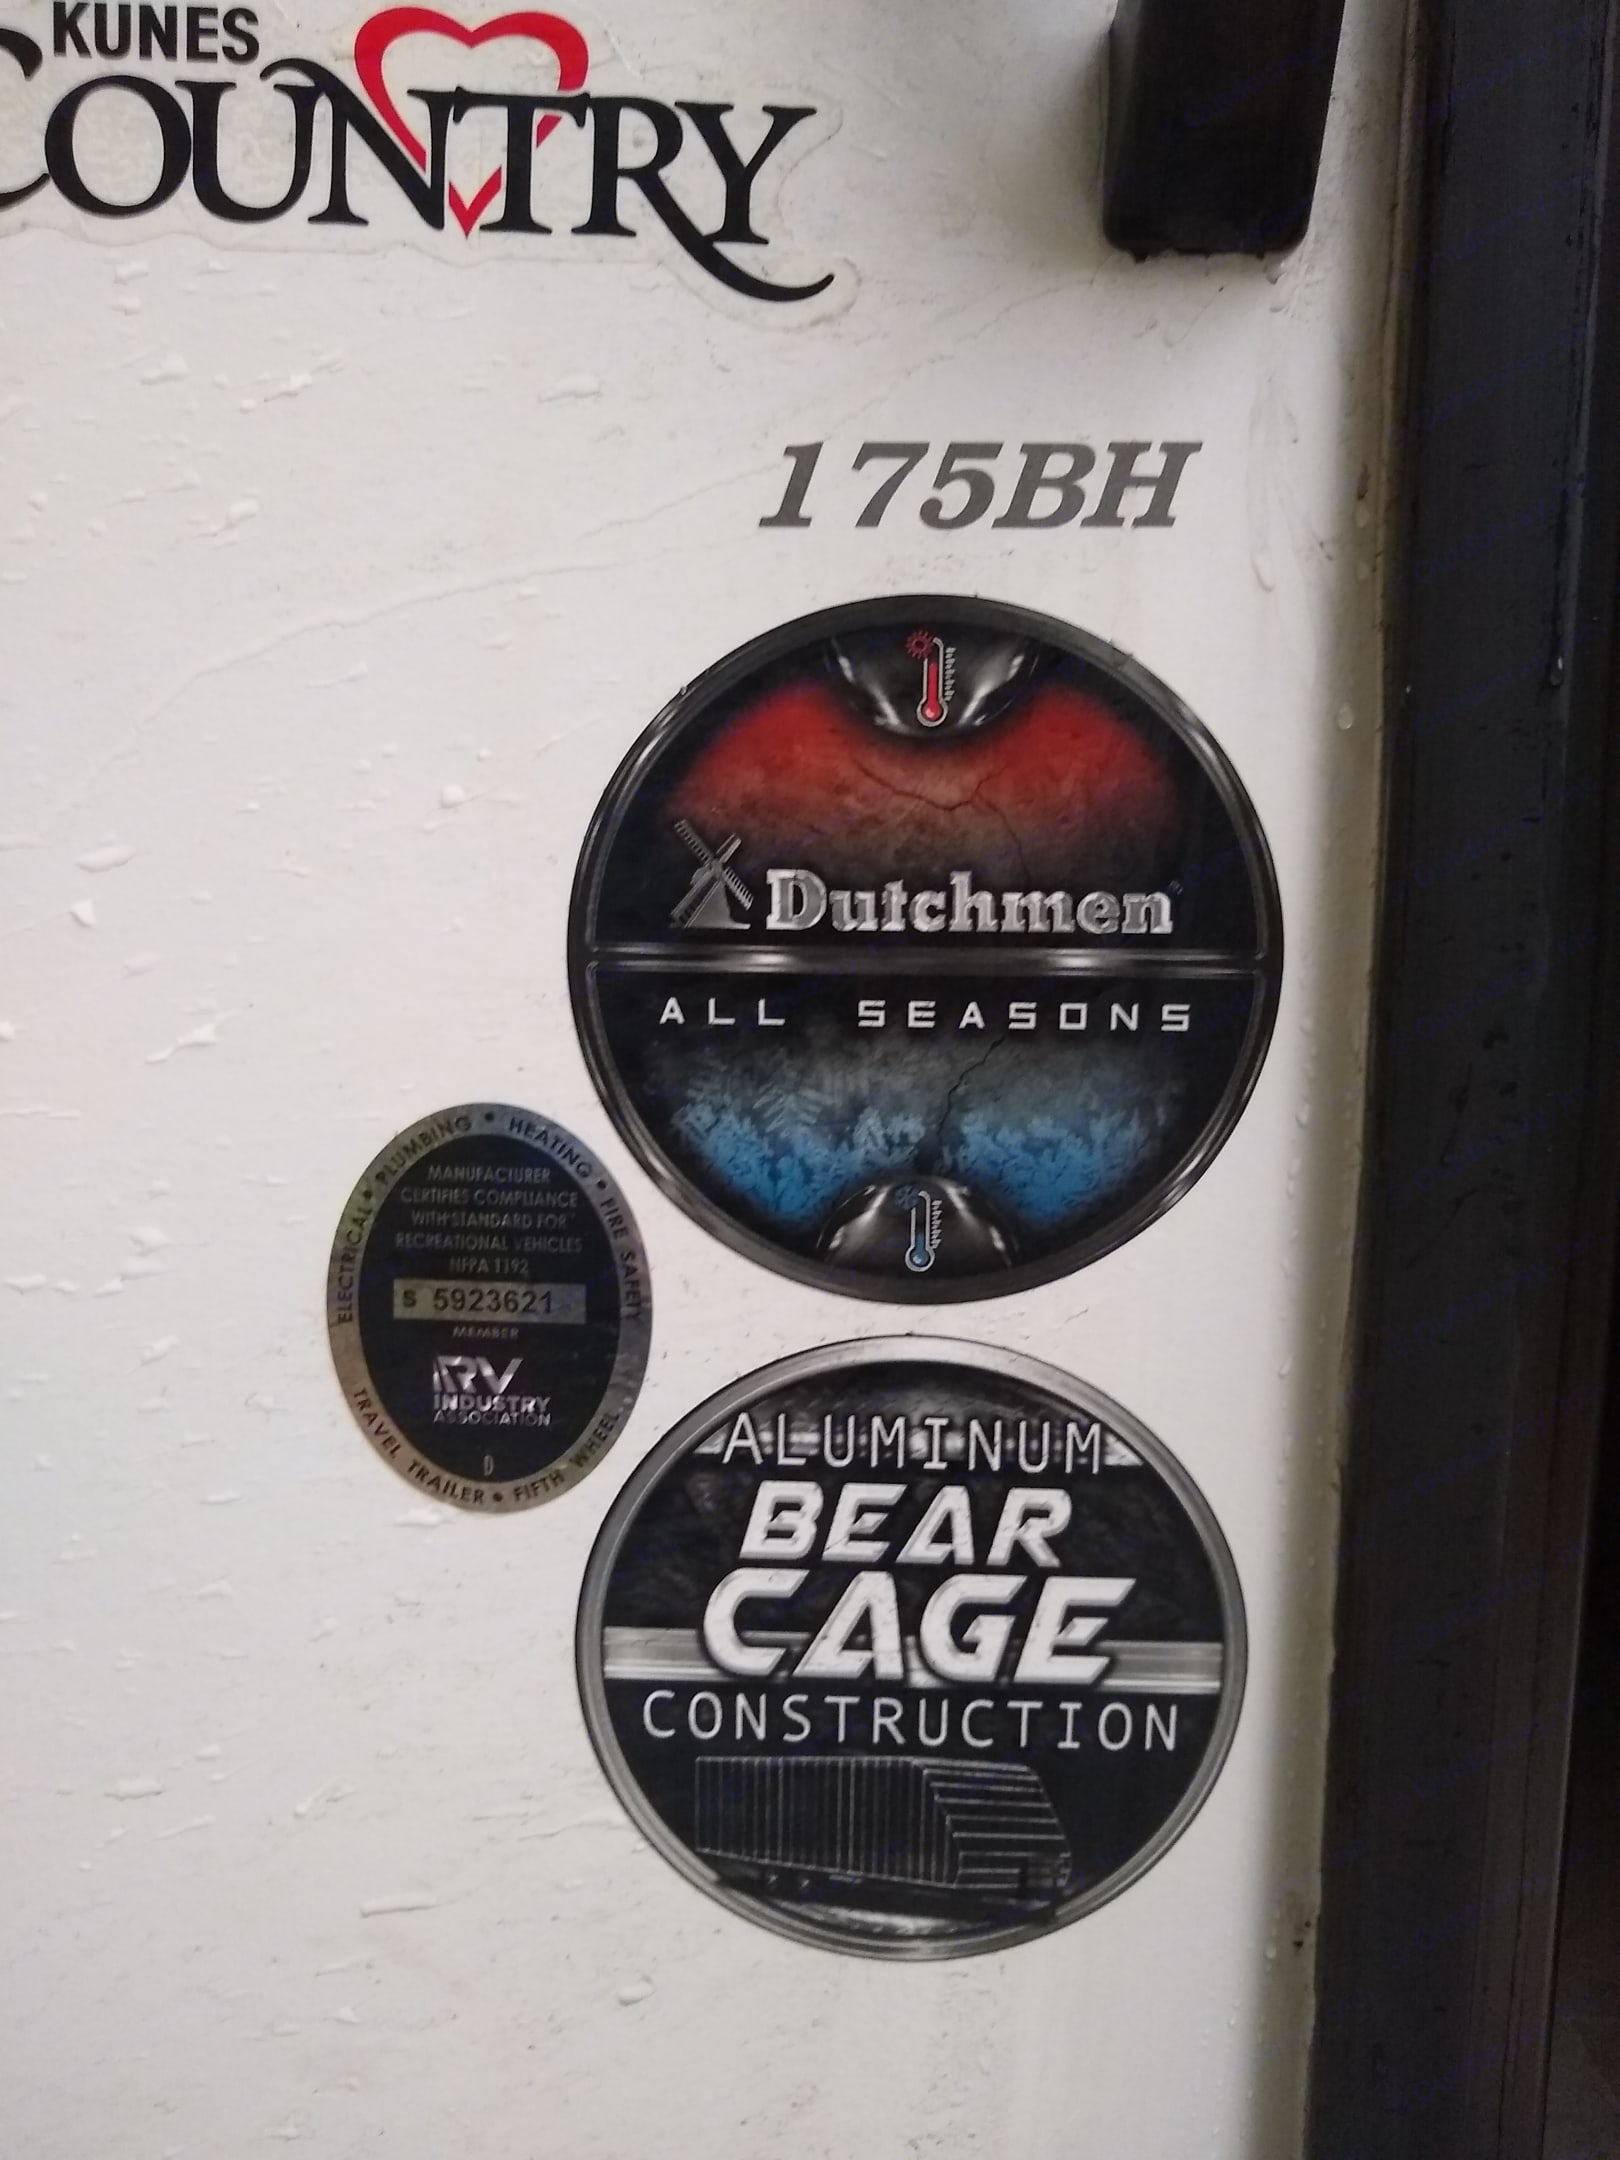 All-Season and Bear Cage certs. Dutchmen Kodiak Cub 175BH 2021